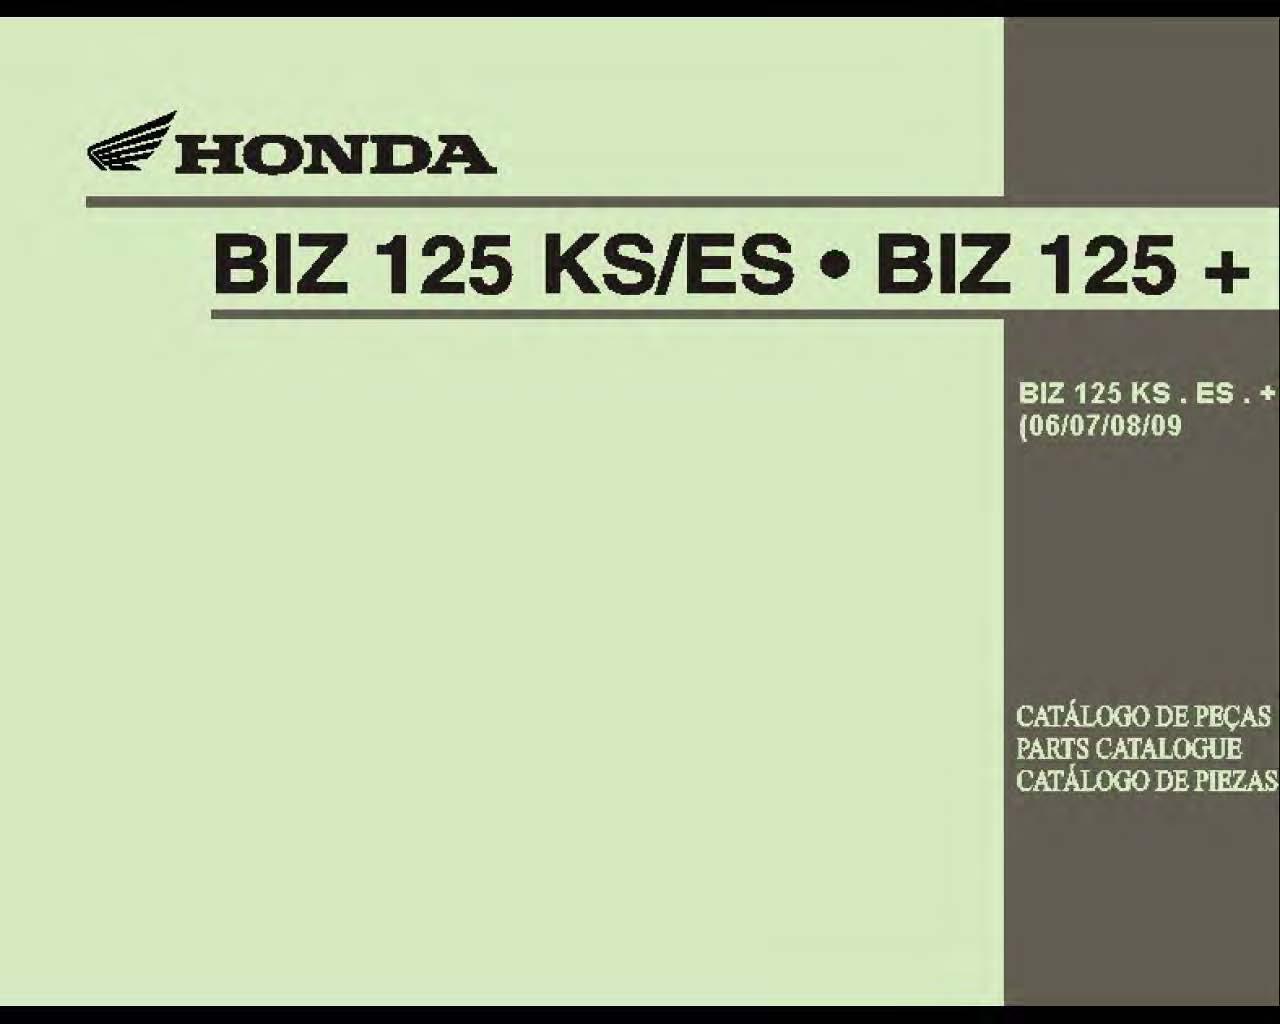 Parts list for Honda BIZ125 + (2006-2009) (Multilingual)